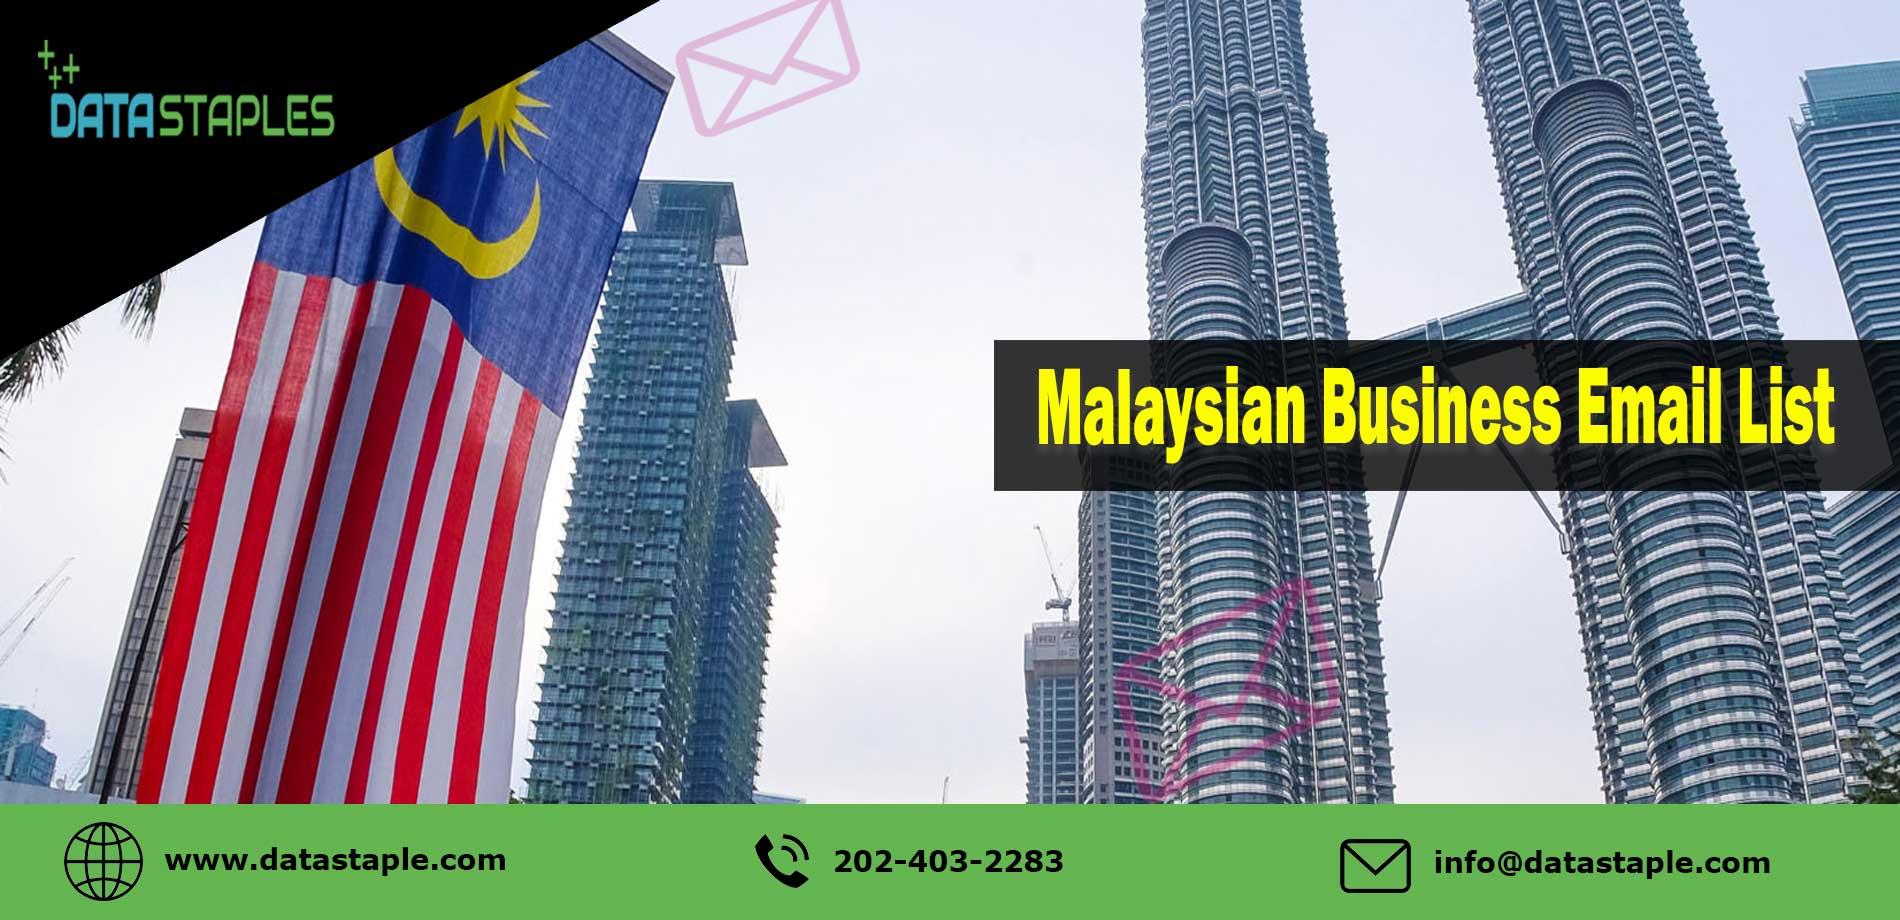 Malaysian Business Email List | DataStaples